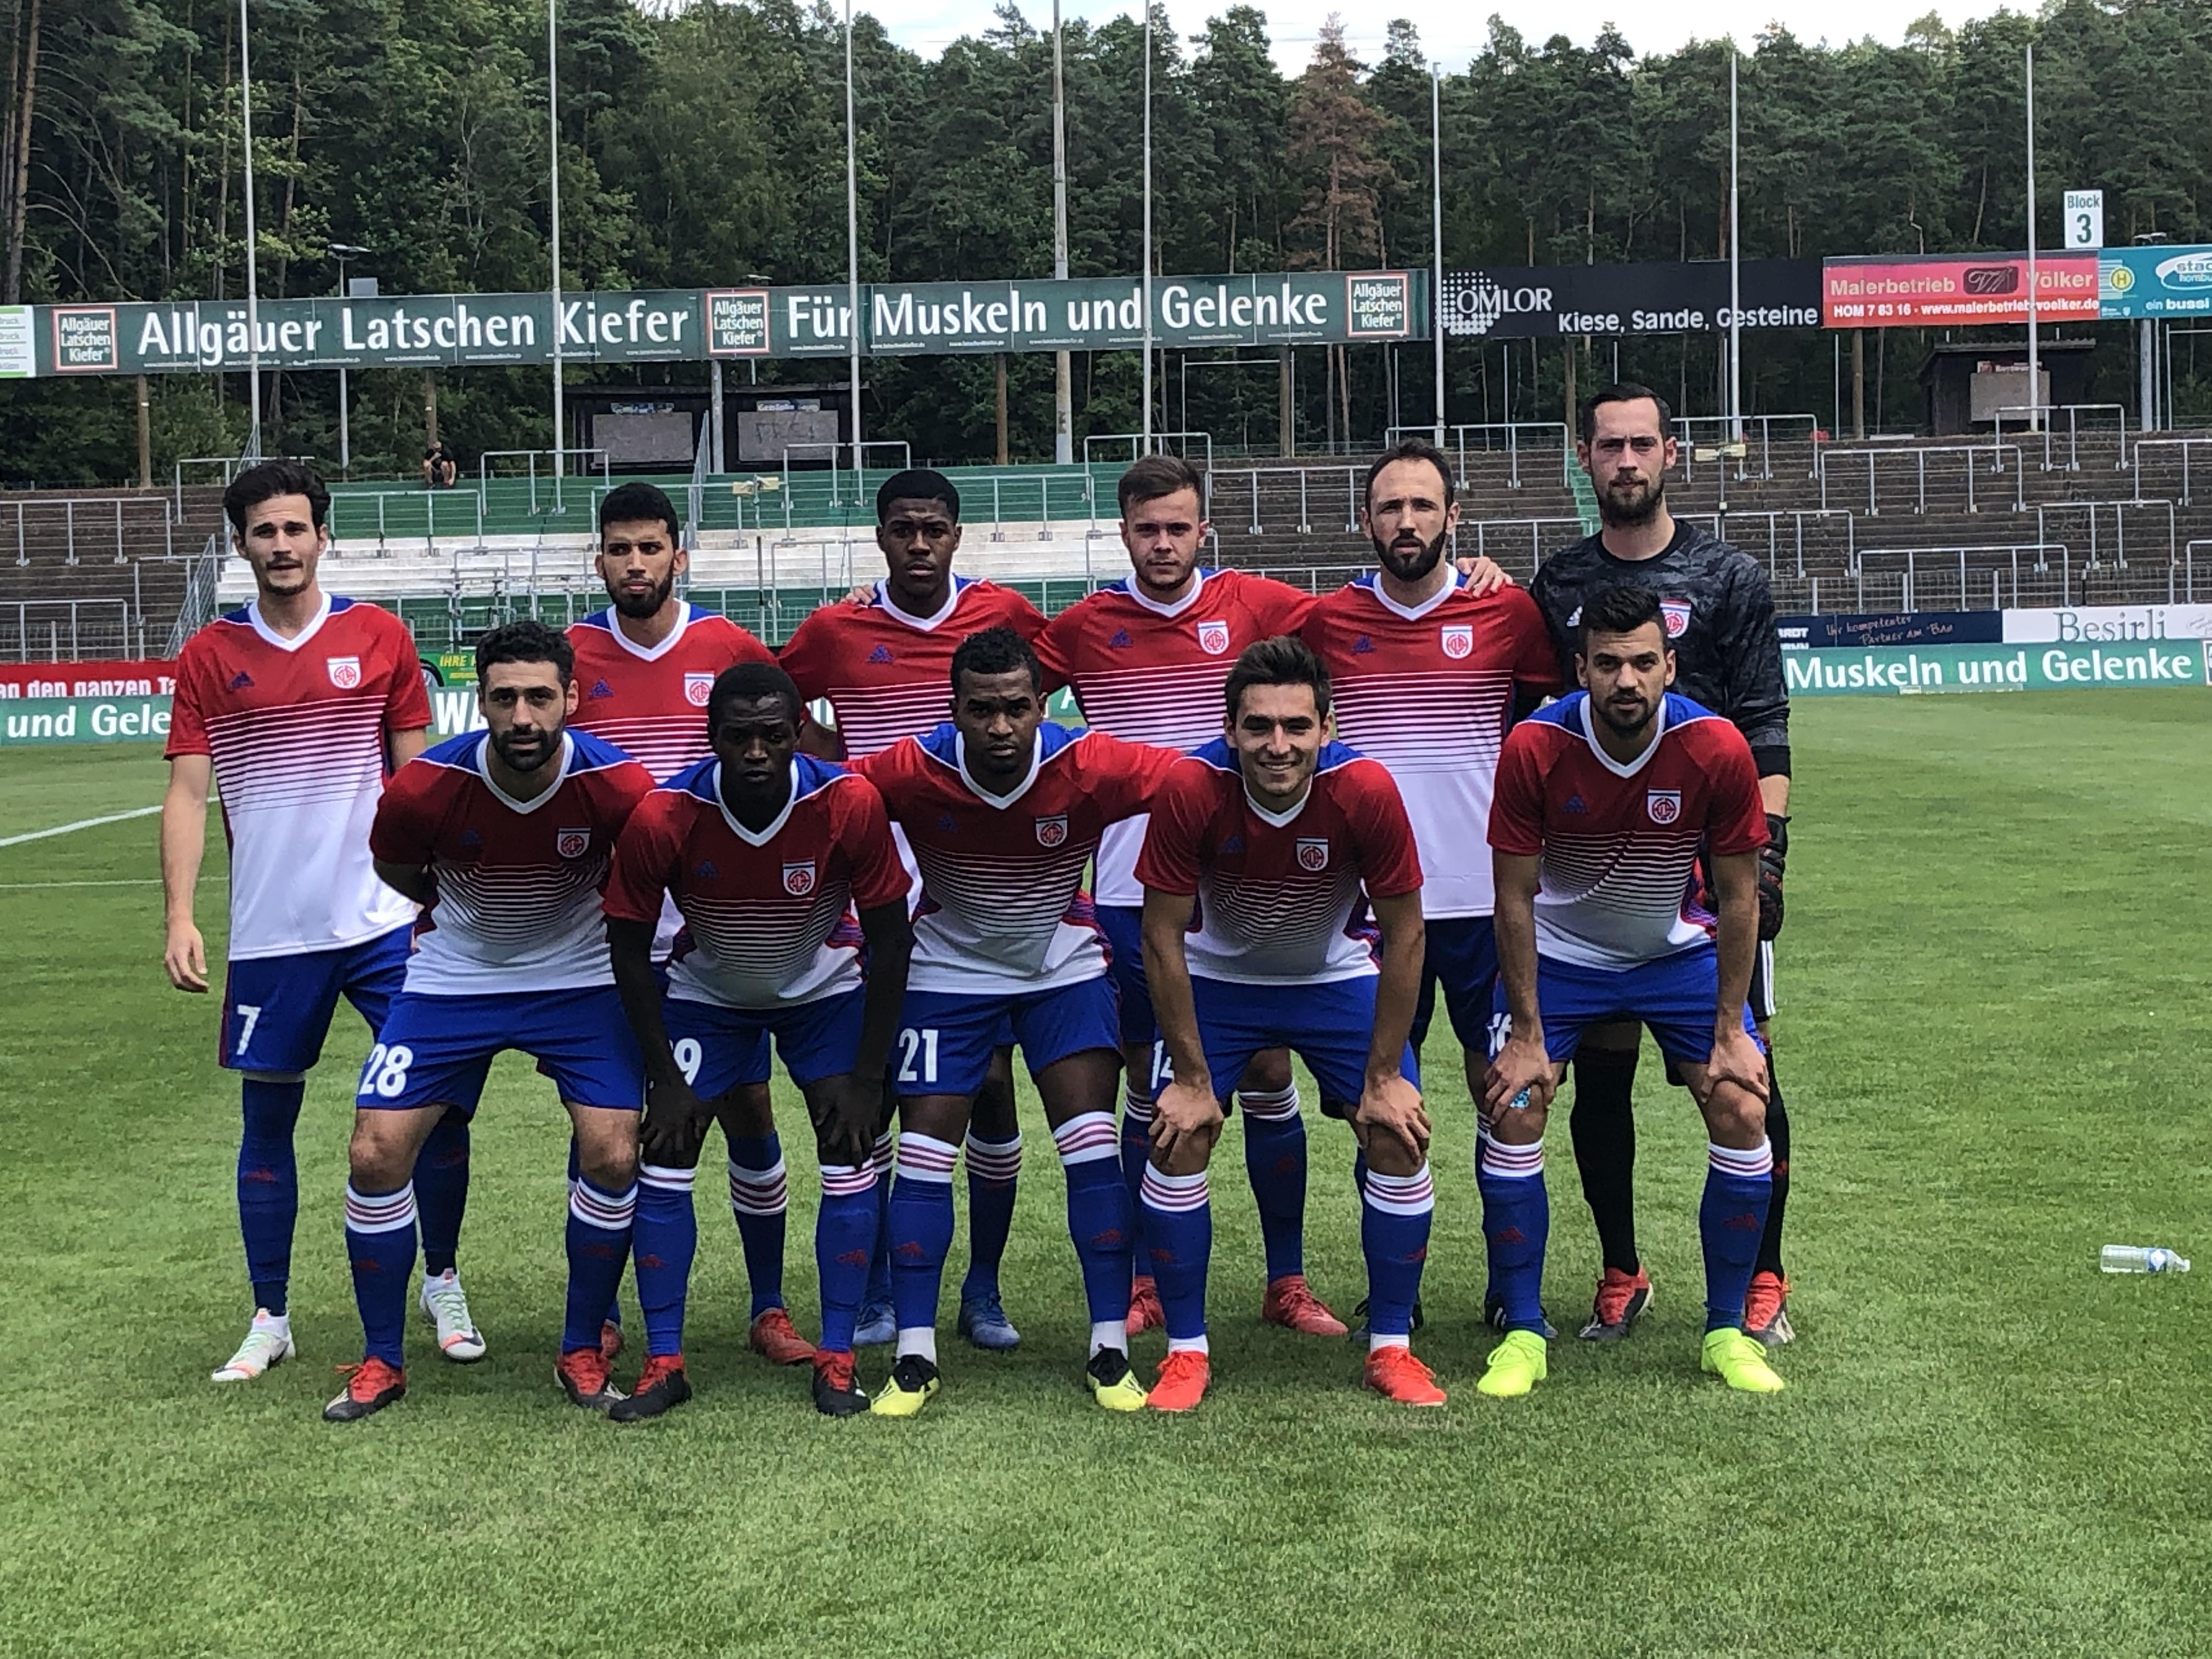 Match de la revanche CS FOLA - FC Homburg 15hrs samedi 15/02/2020 (1-0 perdu en été)